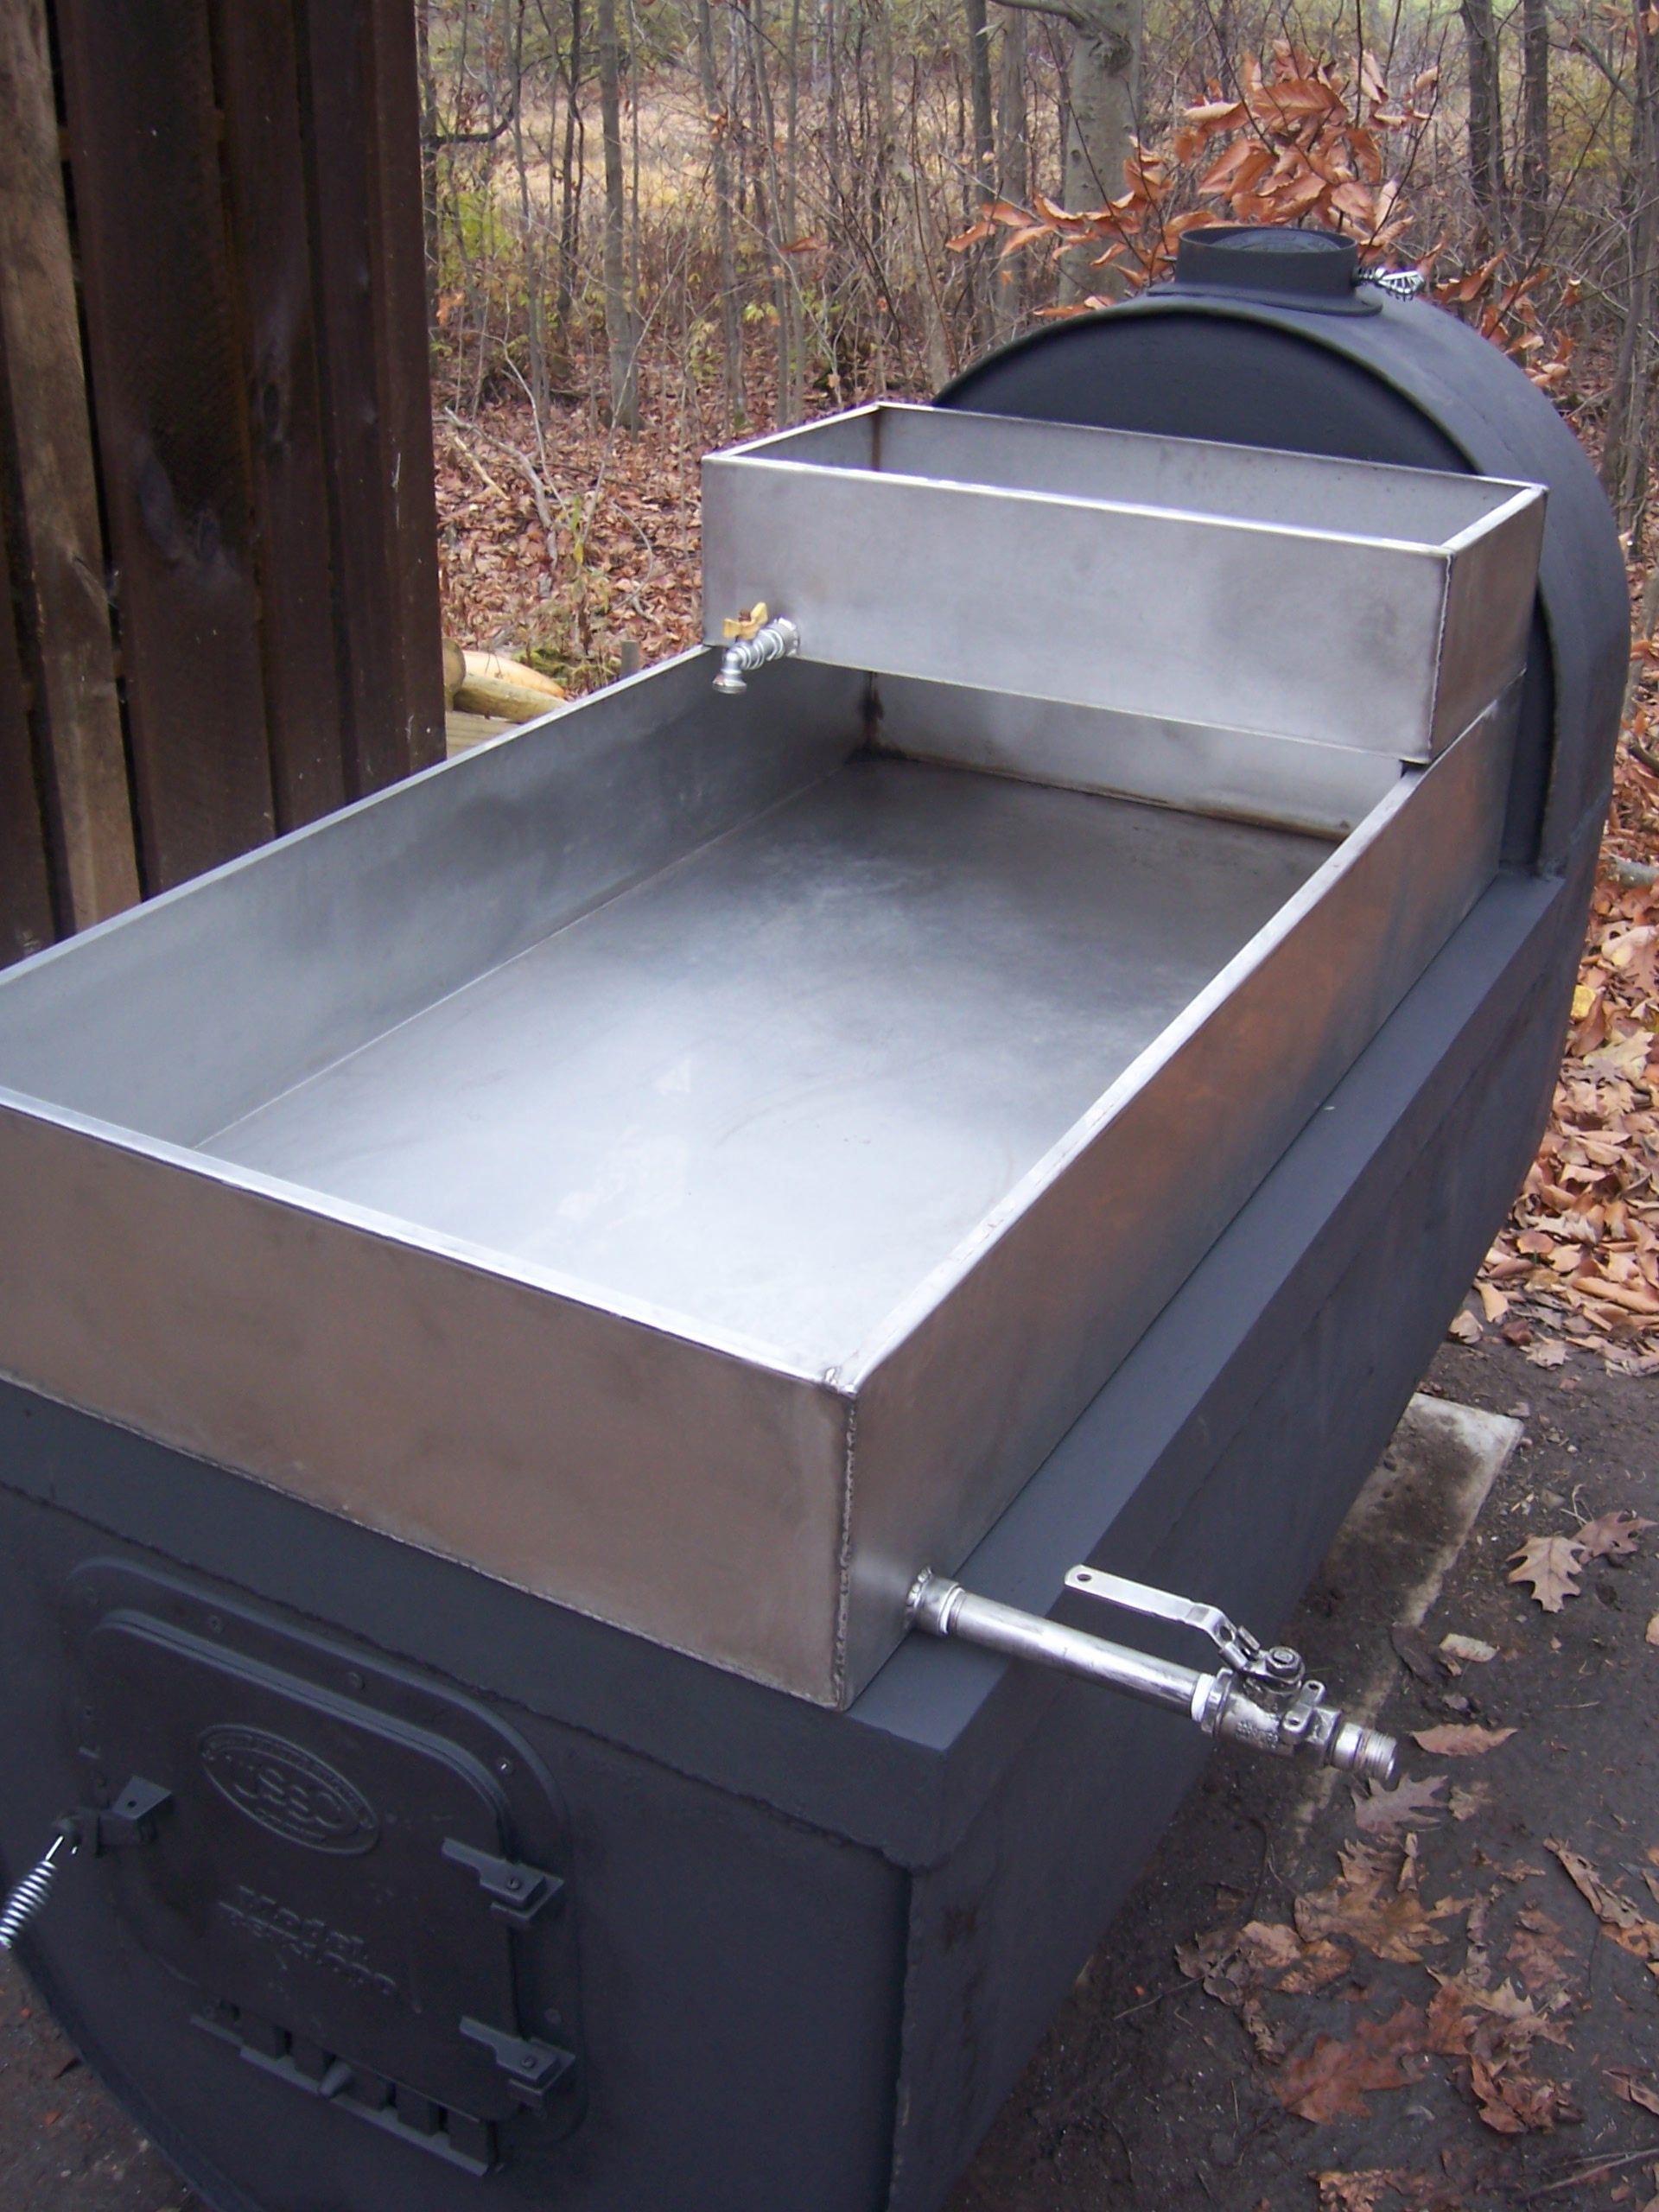 Backyard Maple Syrup Evaporator - HOME DECOR